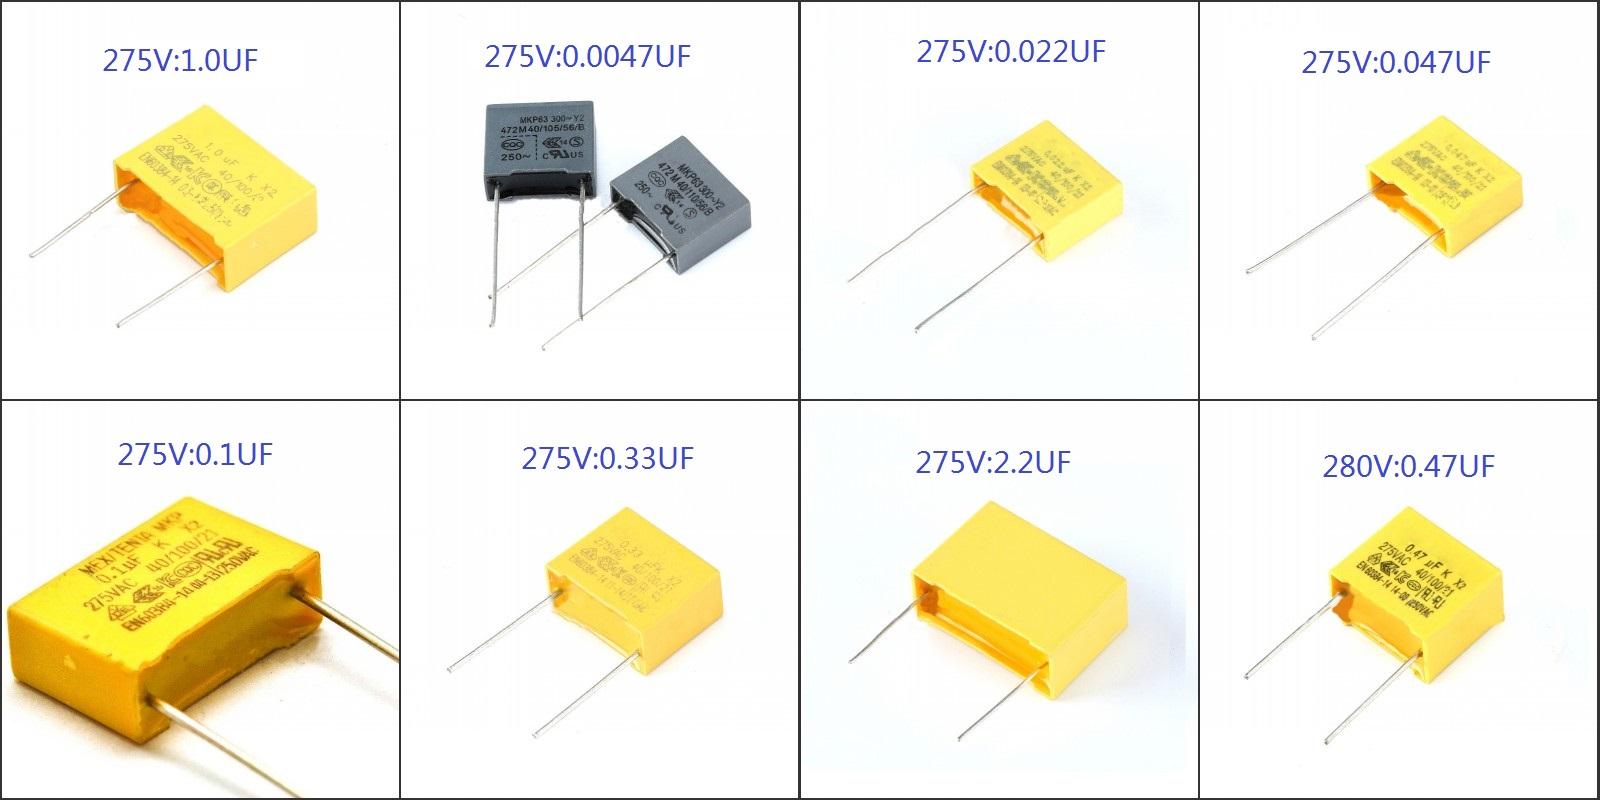 0.047uF 47nF XRY GPF Safety Suppression Capacitors MPX//MKP X2 275VAC